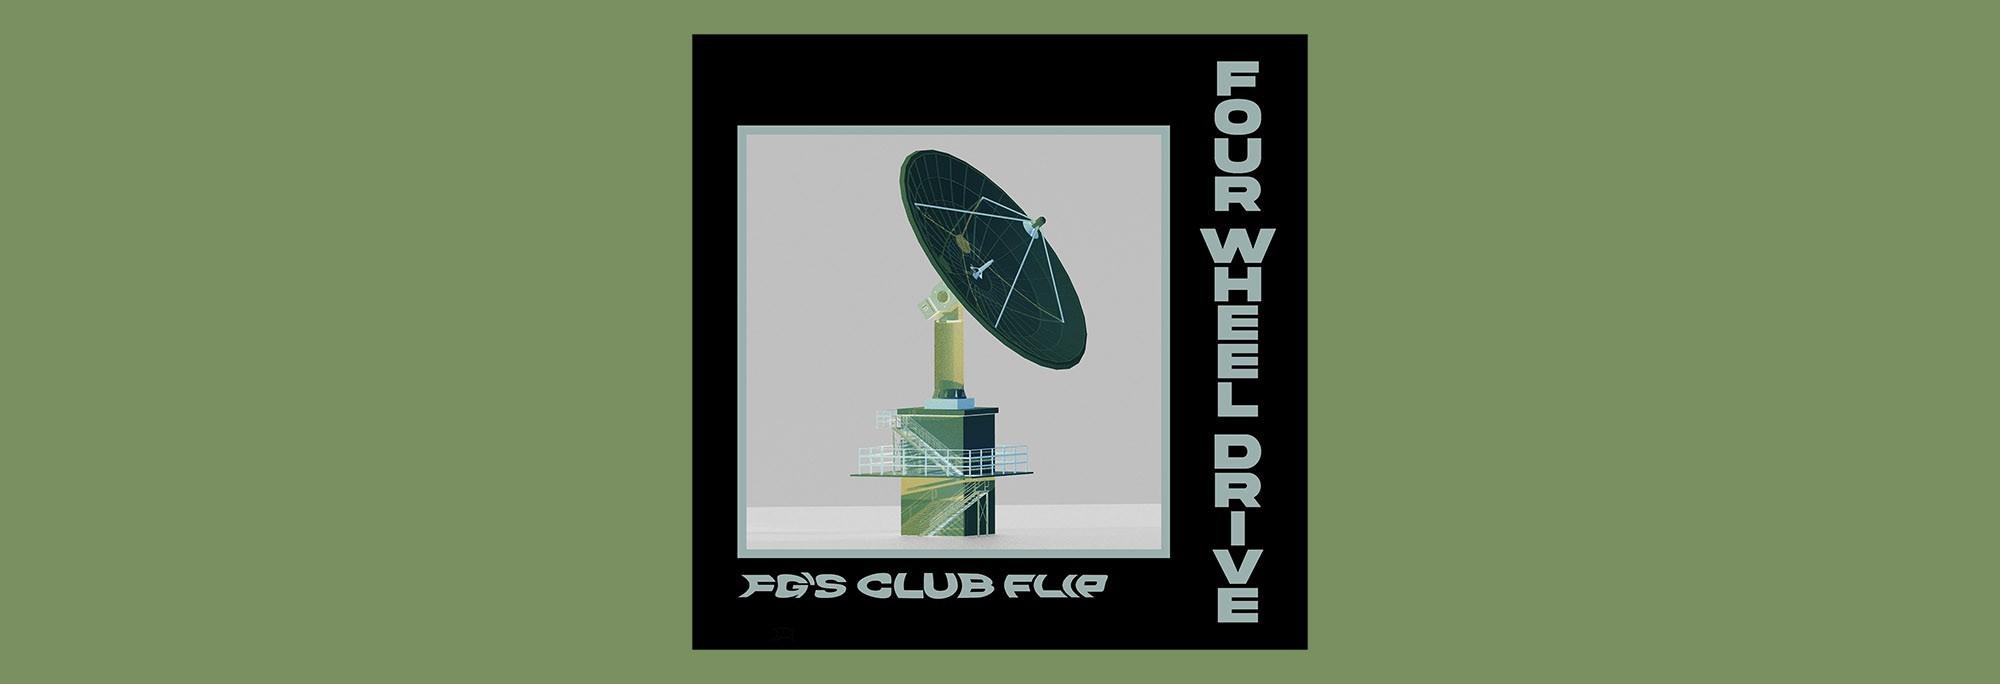 Folly Group - Four Wheel Drive (FG's Club Flip)